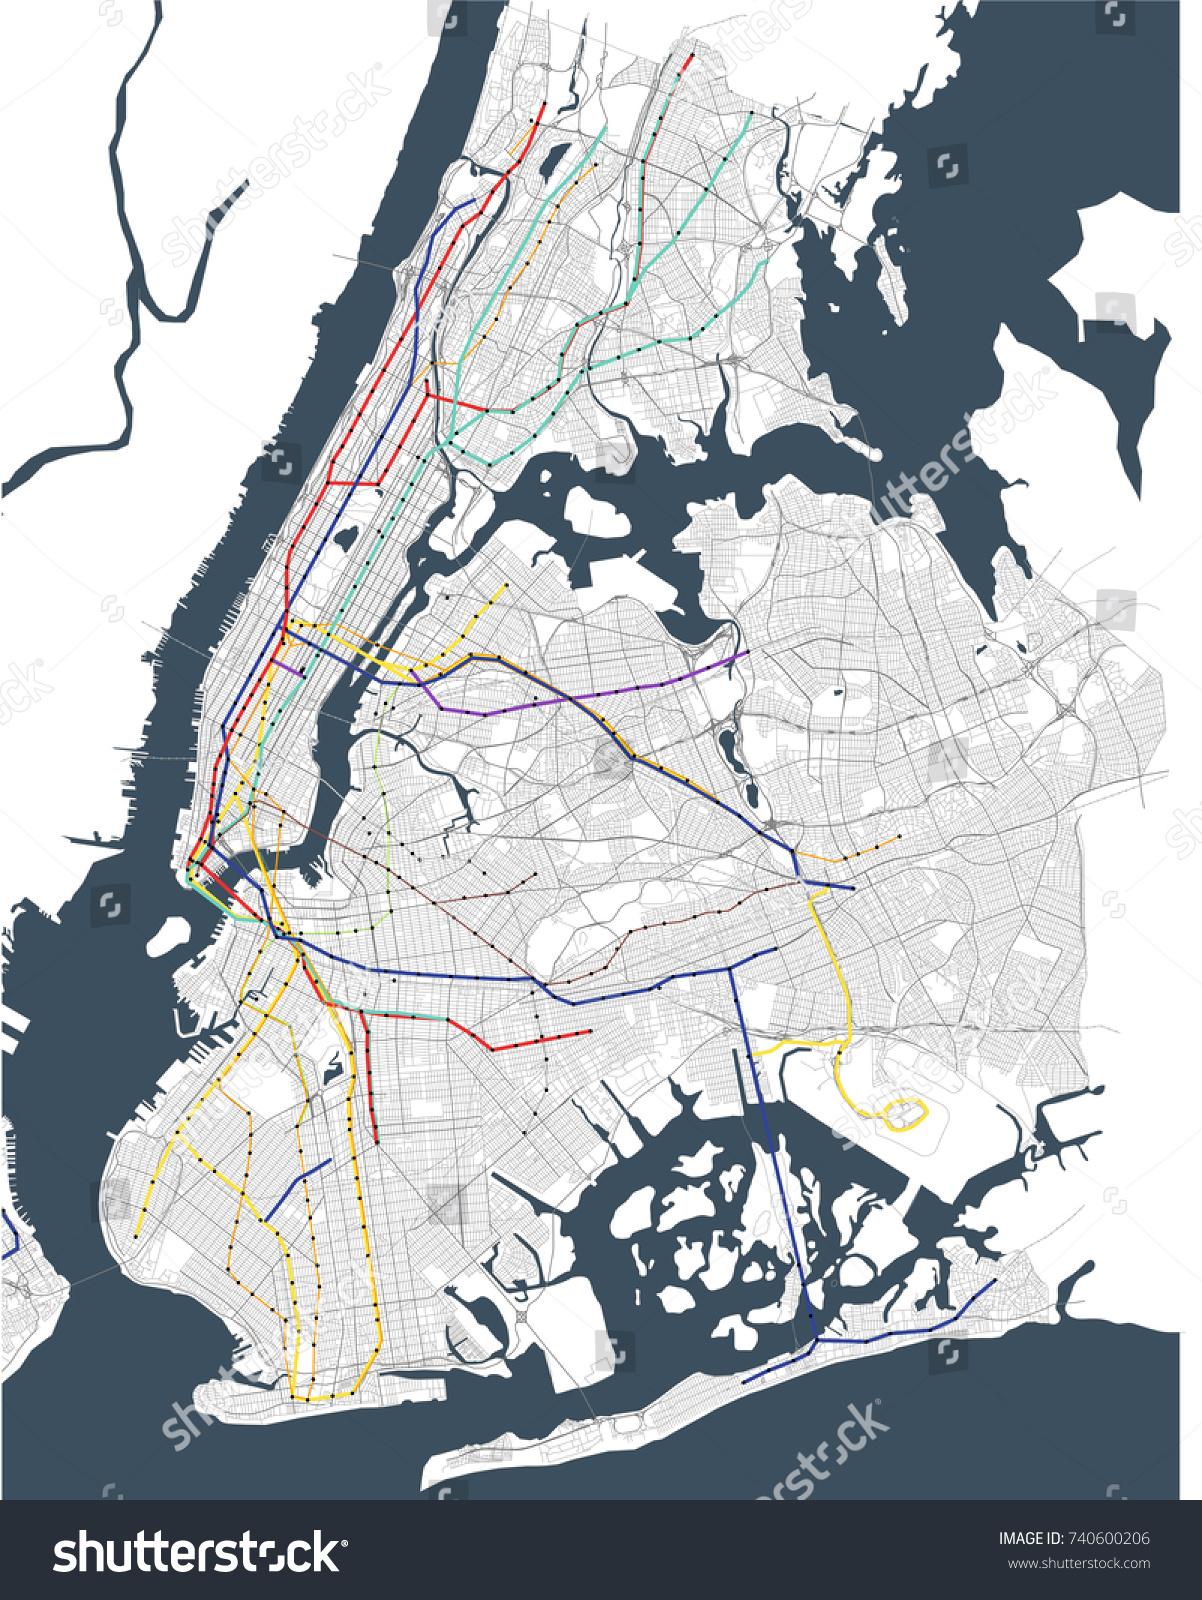 Illustration Map Metro New York City Stock Illustration 740600206